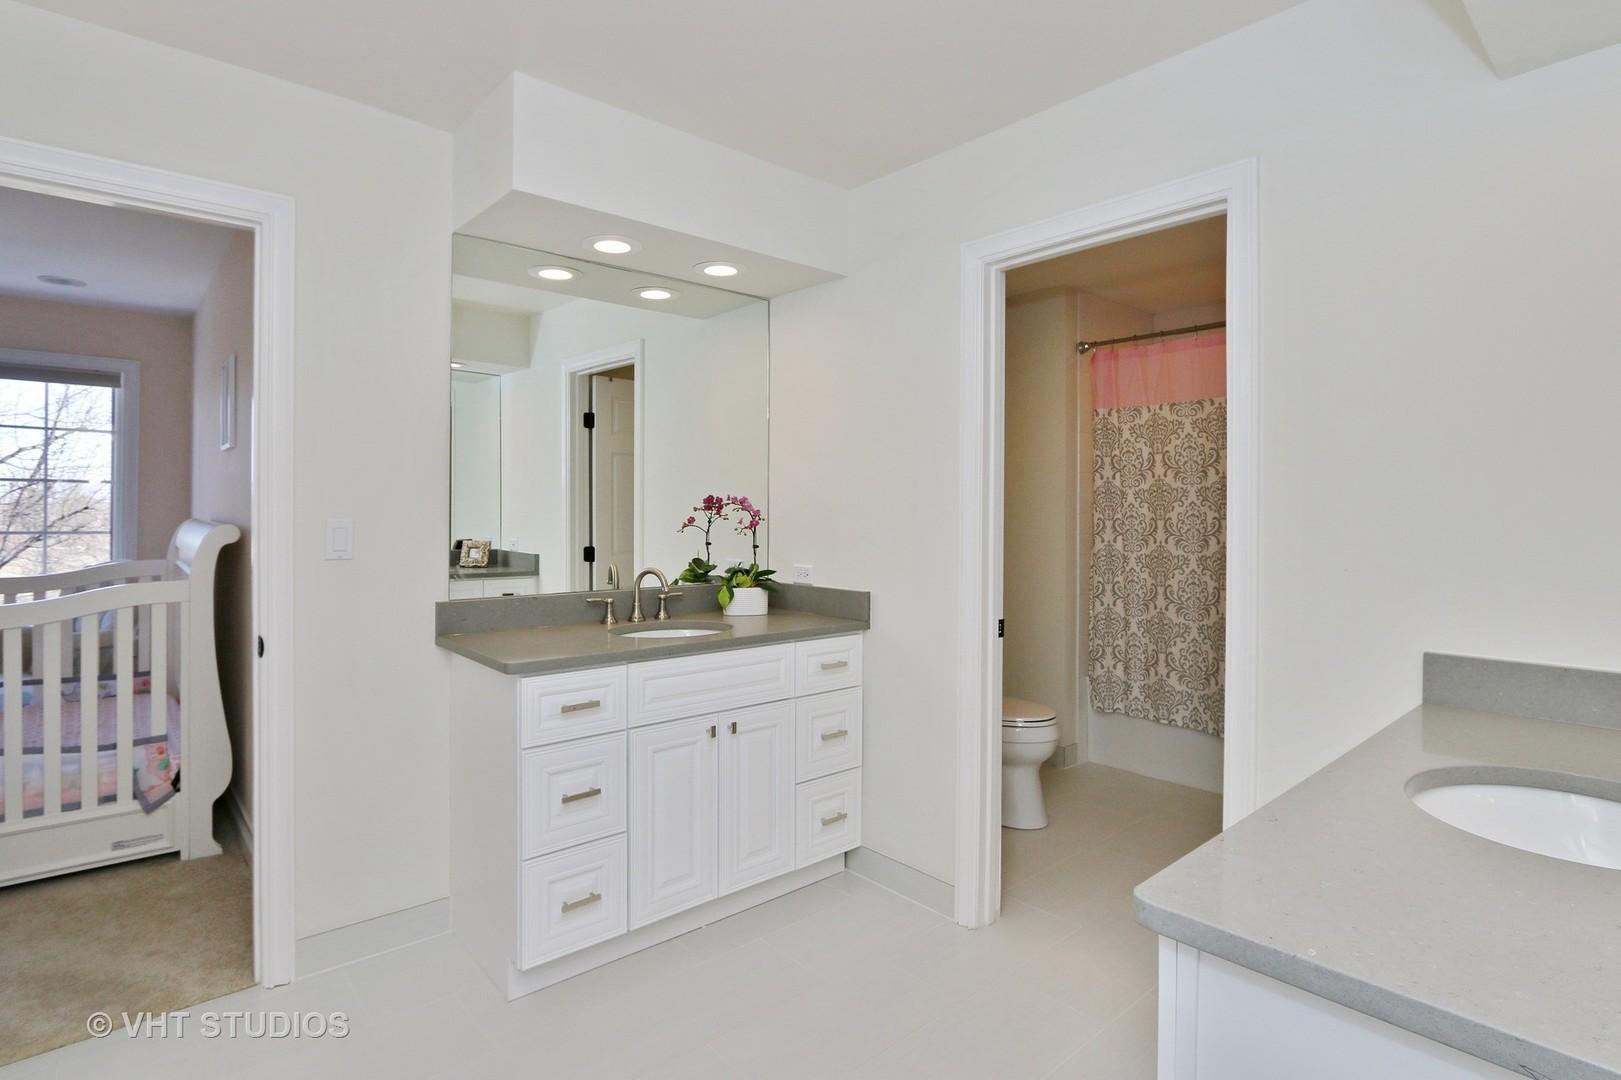 PropertyUP[09886762]|sale| 203 Peregrine Hawthorn woods, Illinois 60047